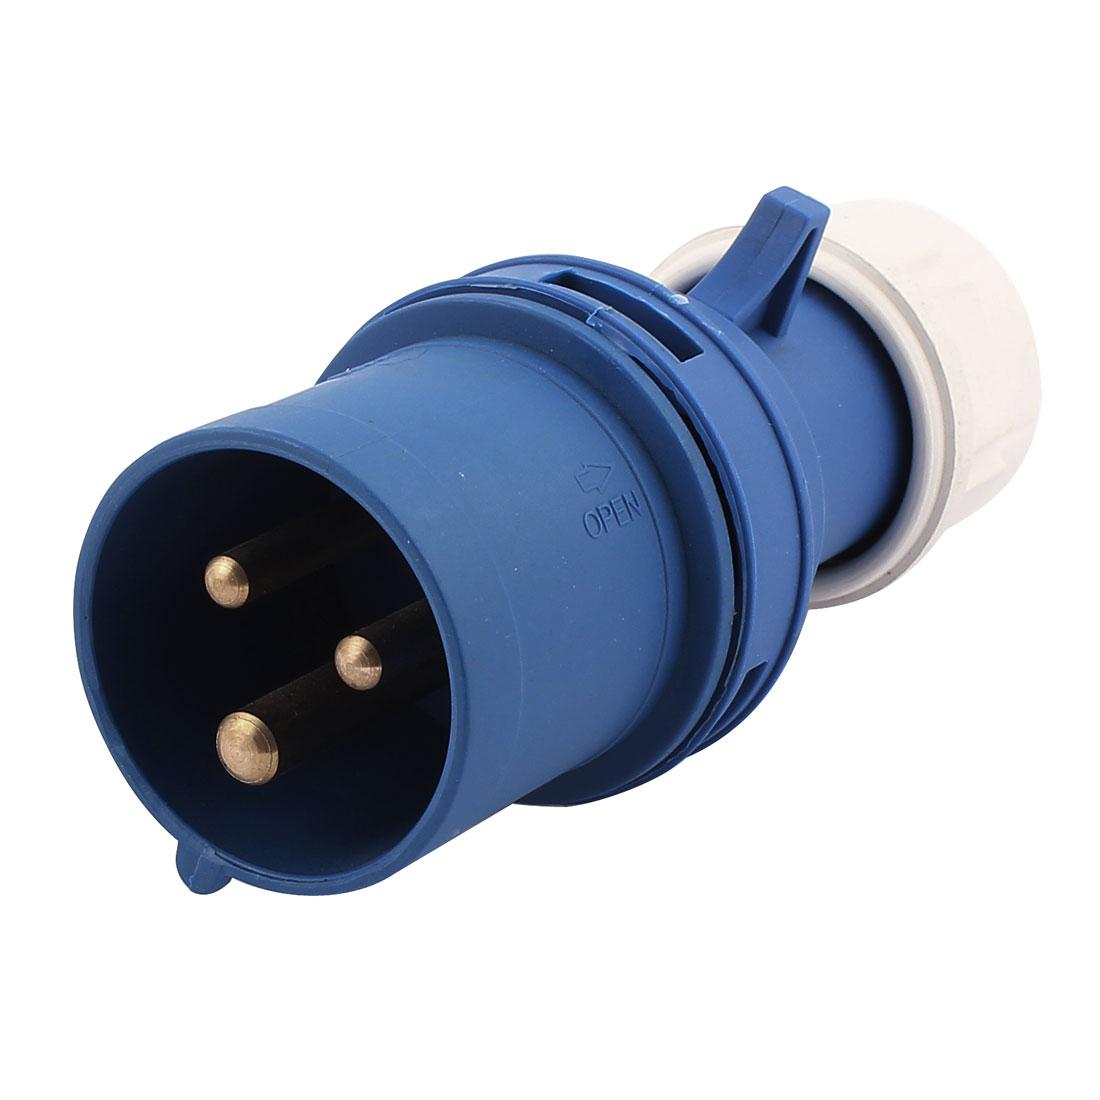 AC 200V-250V 16A IP44 2P+E 3P Male Industrial Electrical Plug